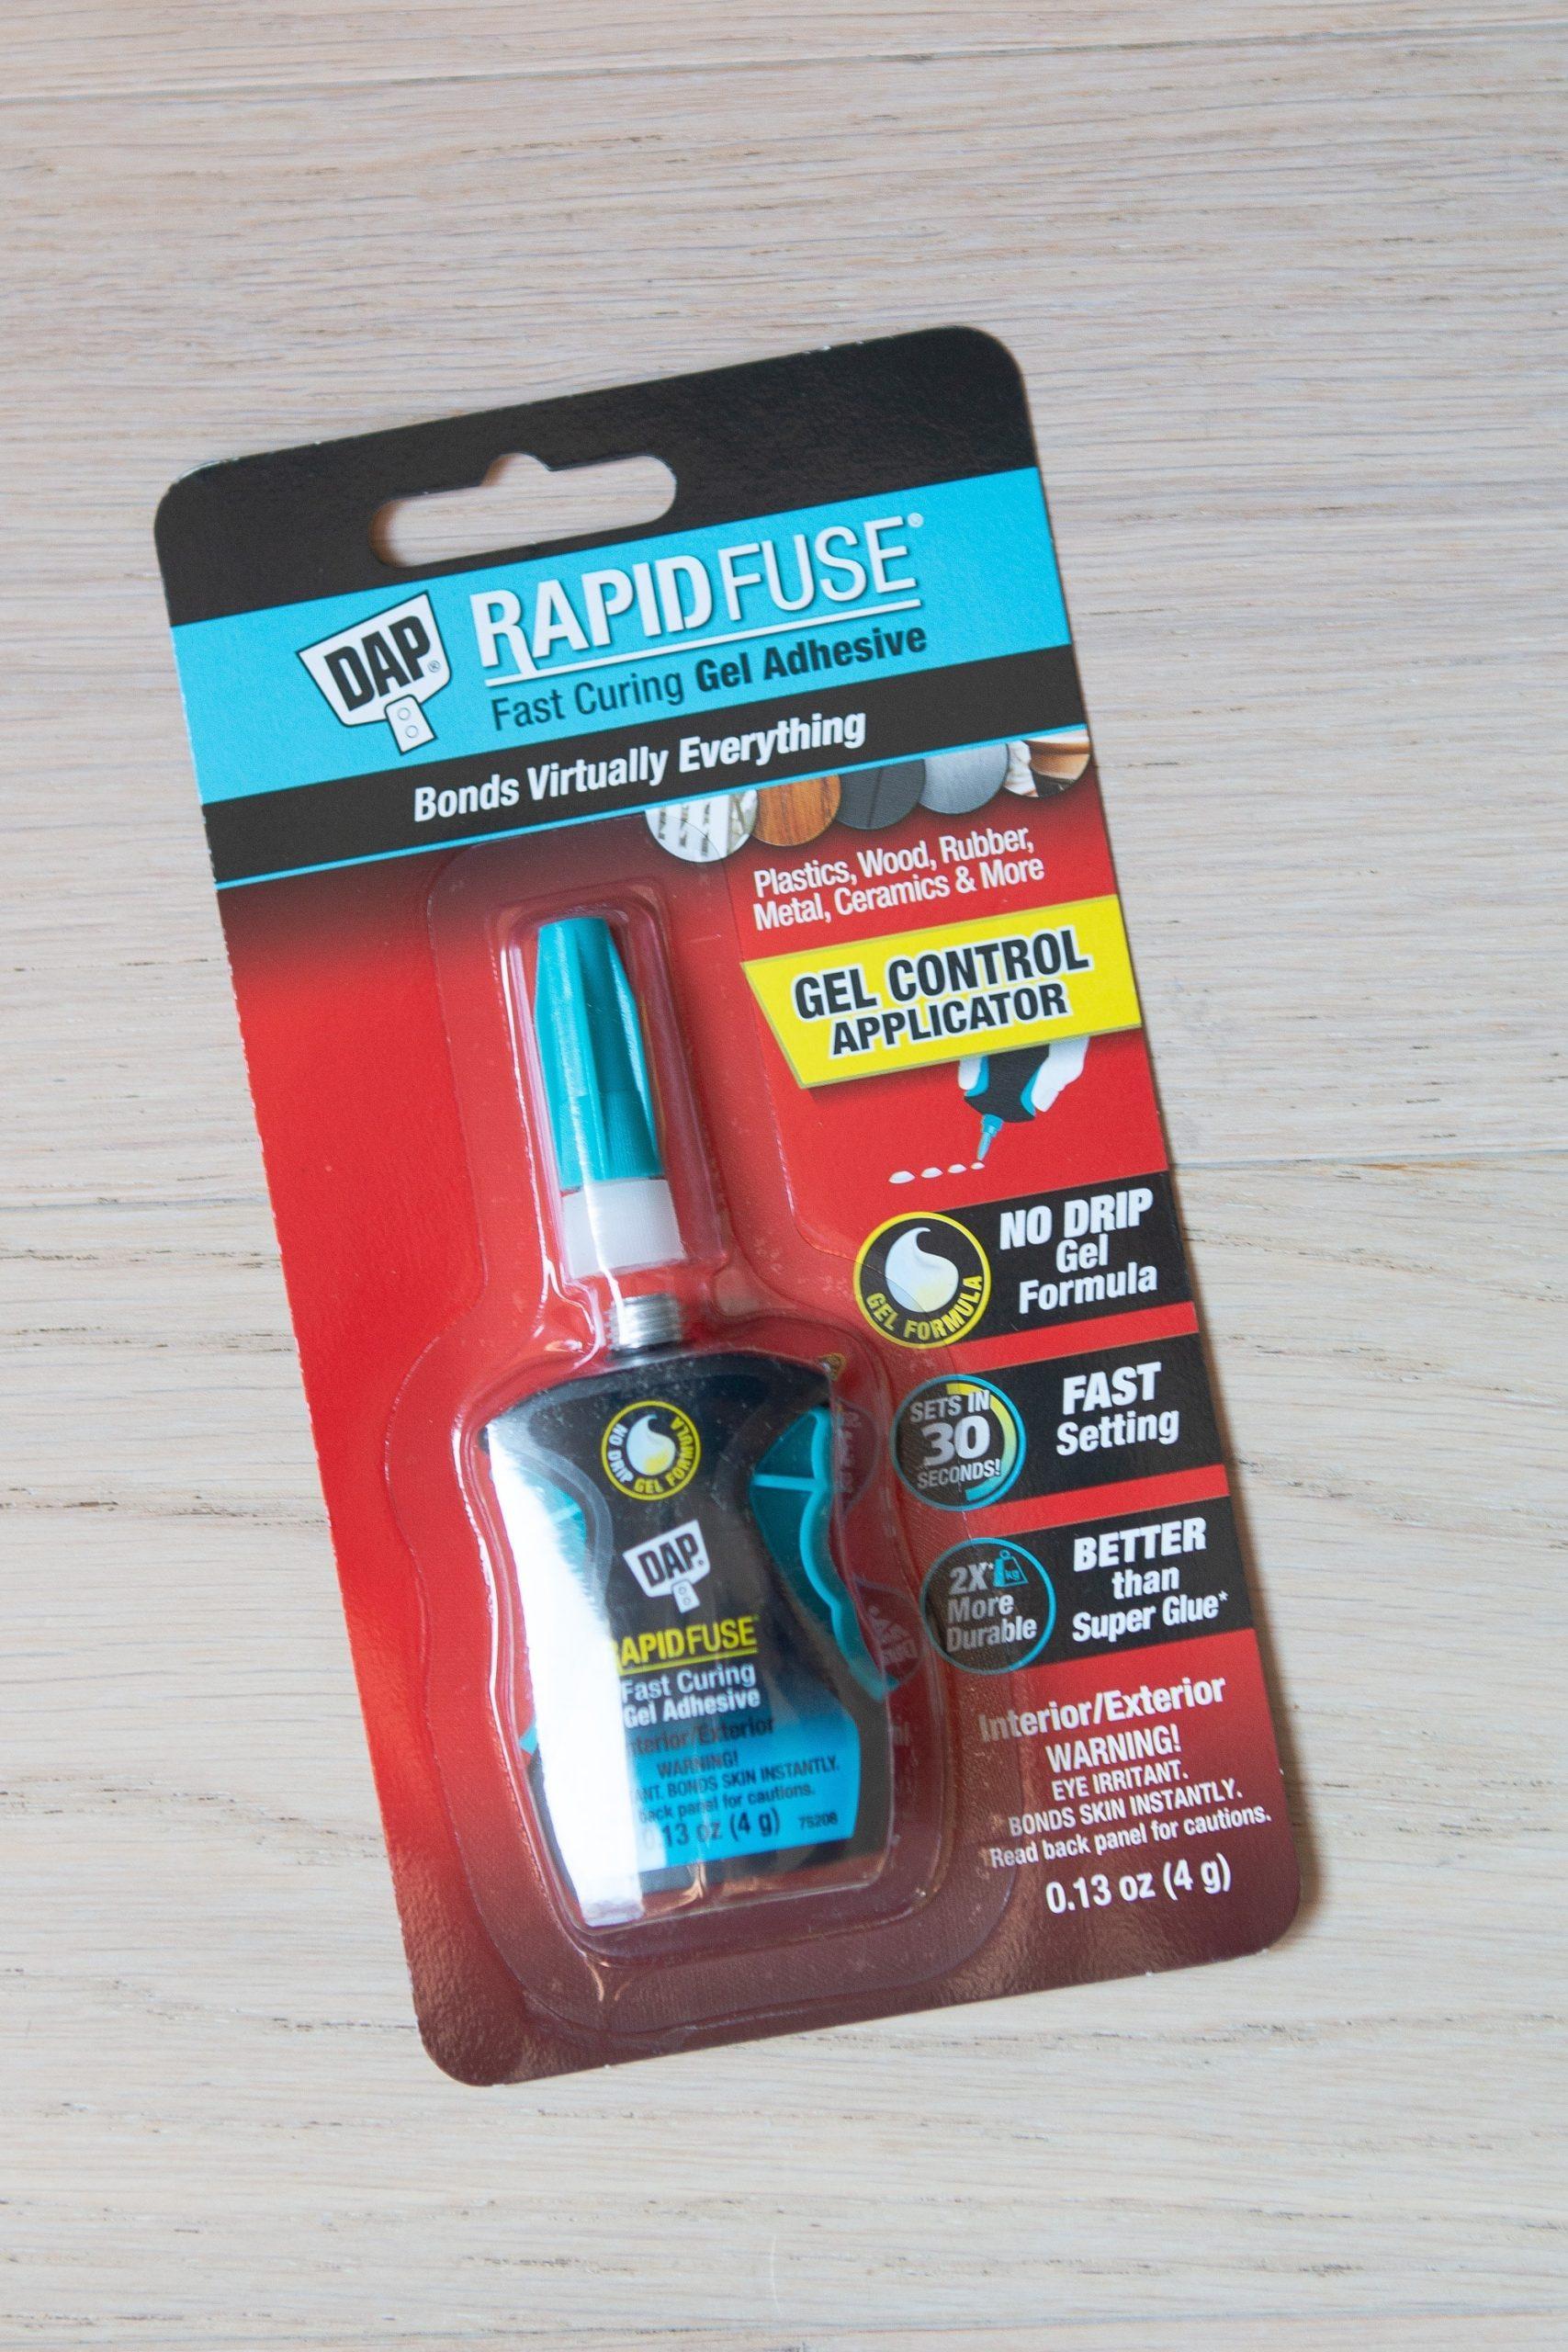 DAP rapidfuse super glue